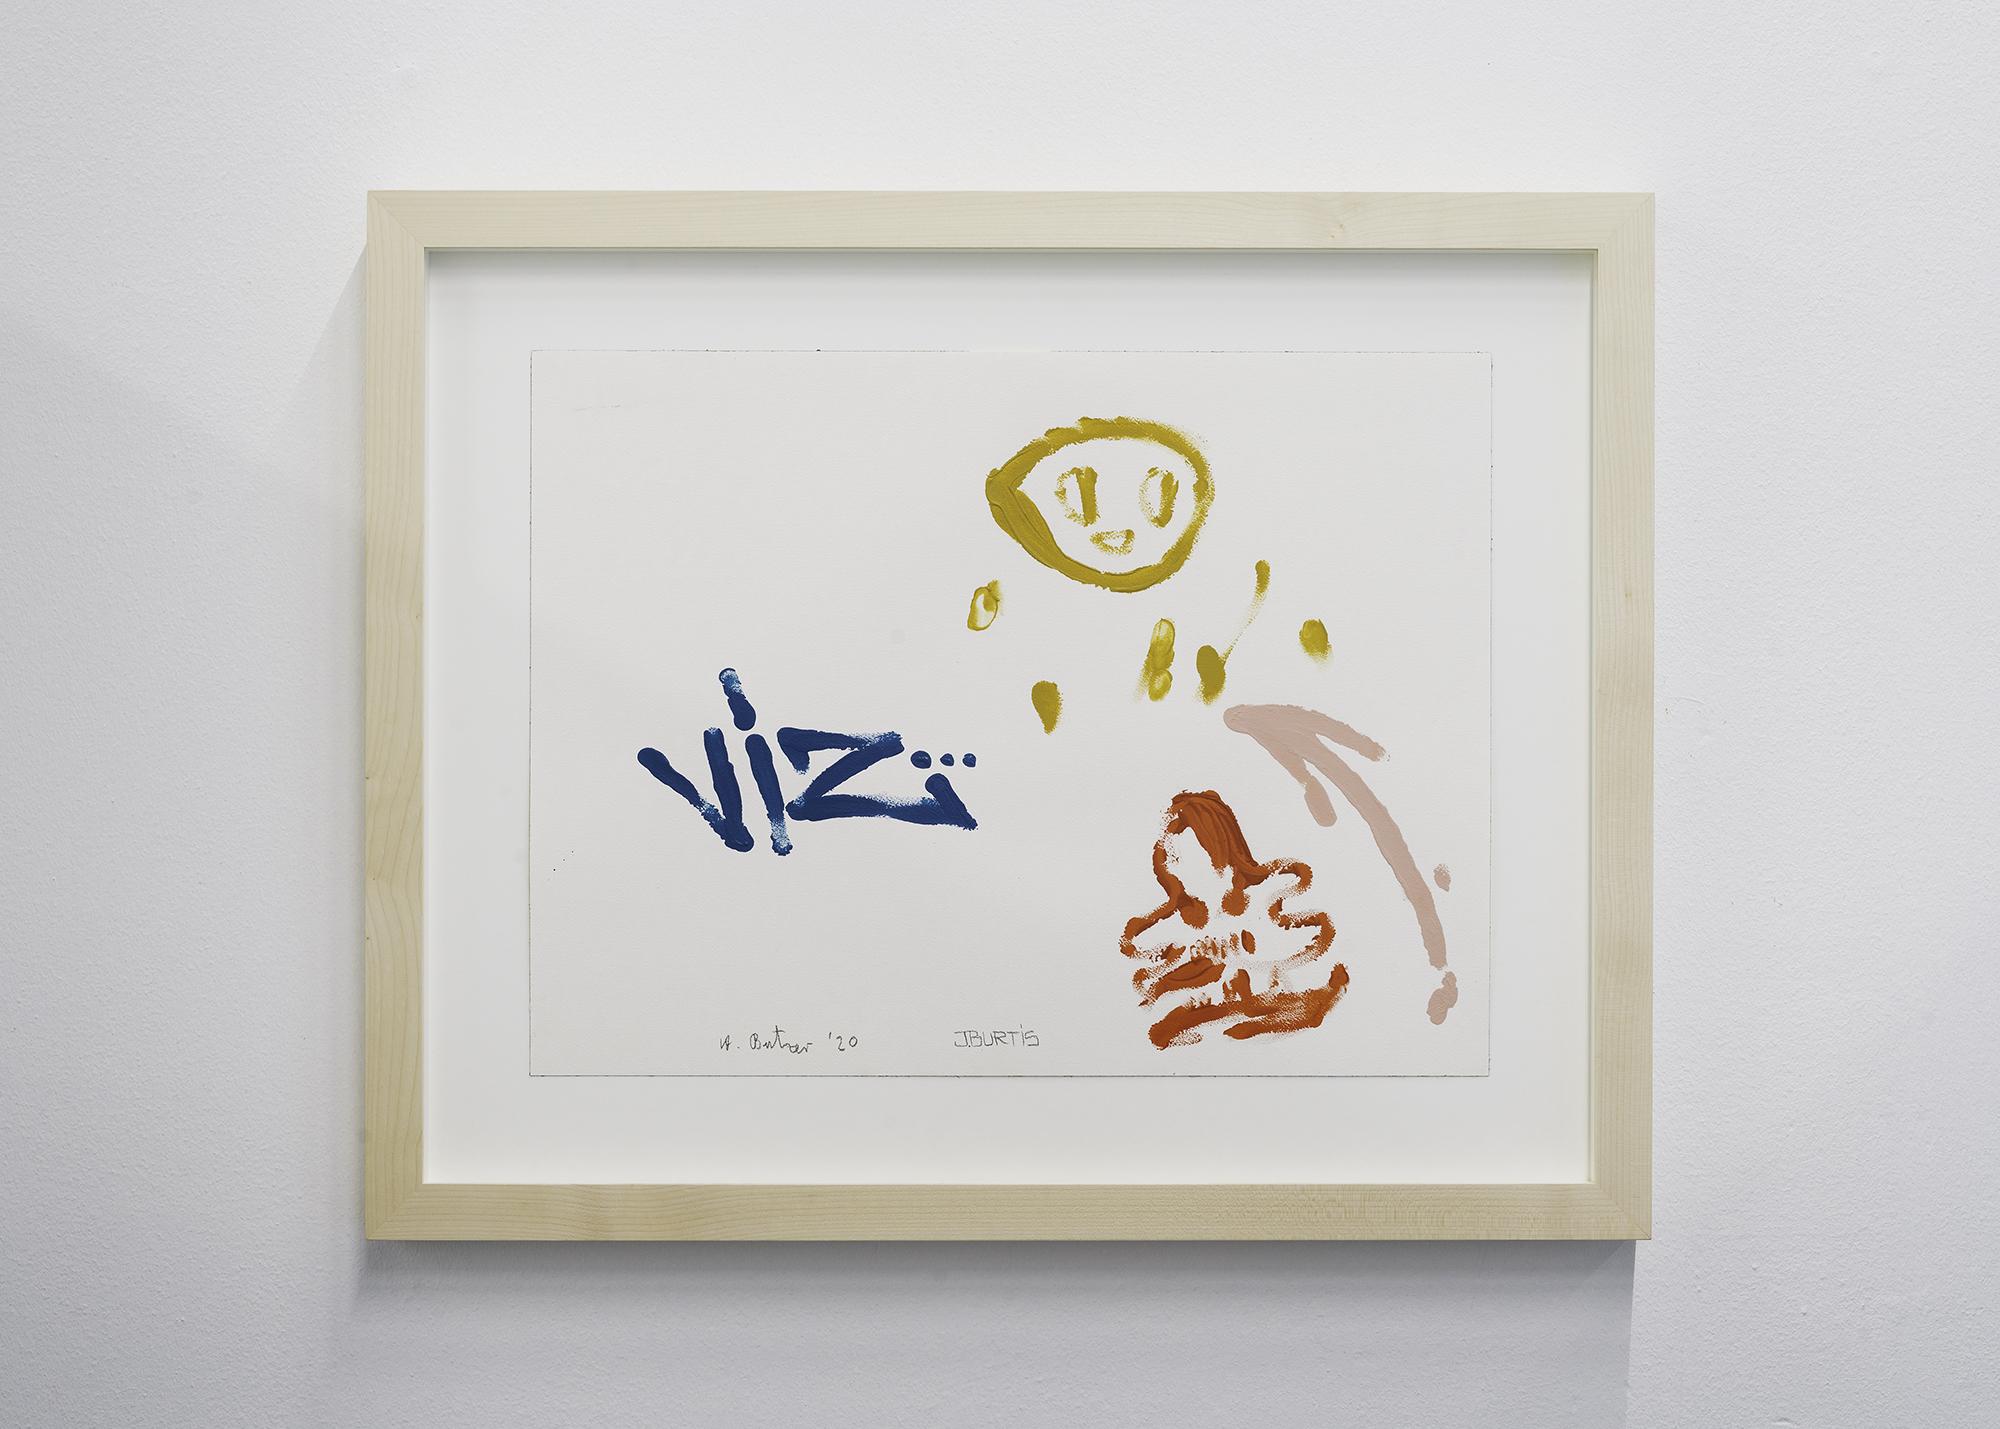 3 Andre Butzer / Jayme Burtis - Untitled, 2020, Acrylic on paper. - 45.72 cm X 60.96 cm. Ex frame